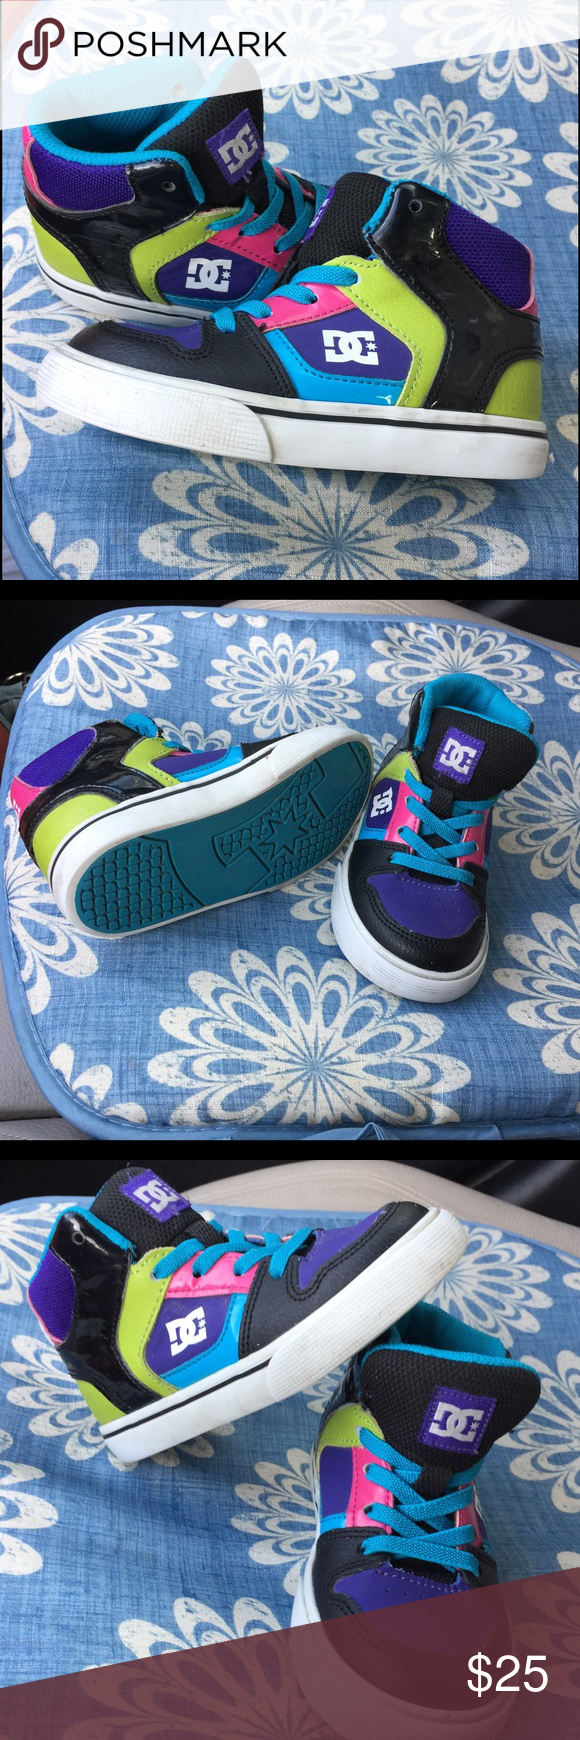 D.C. Shoe, size 7 toddler. Gorgeous DC shoe , excellent condition, colorful. DC Shoes Sneakers